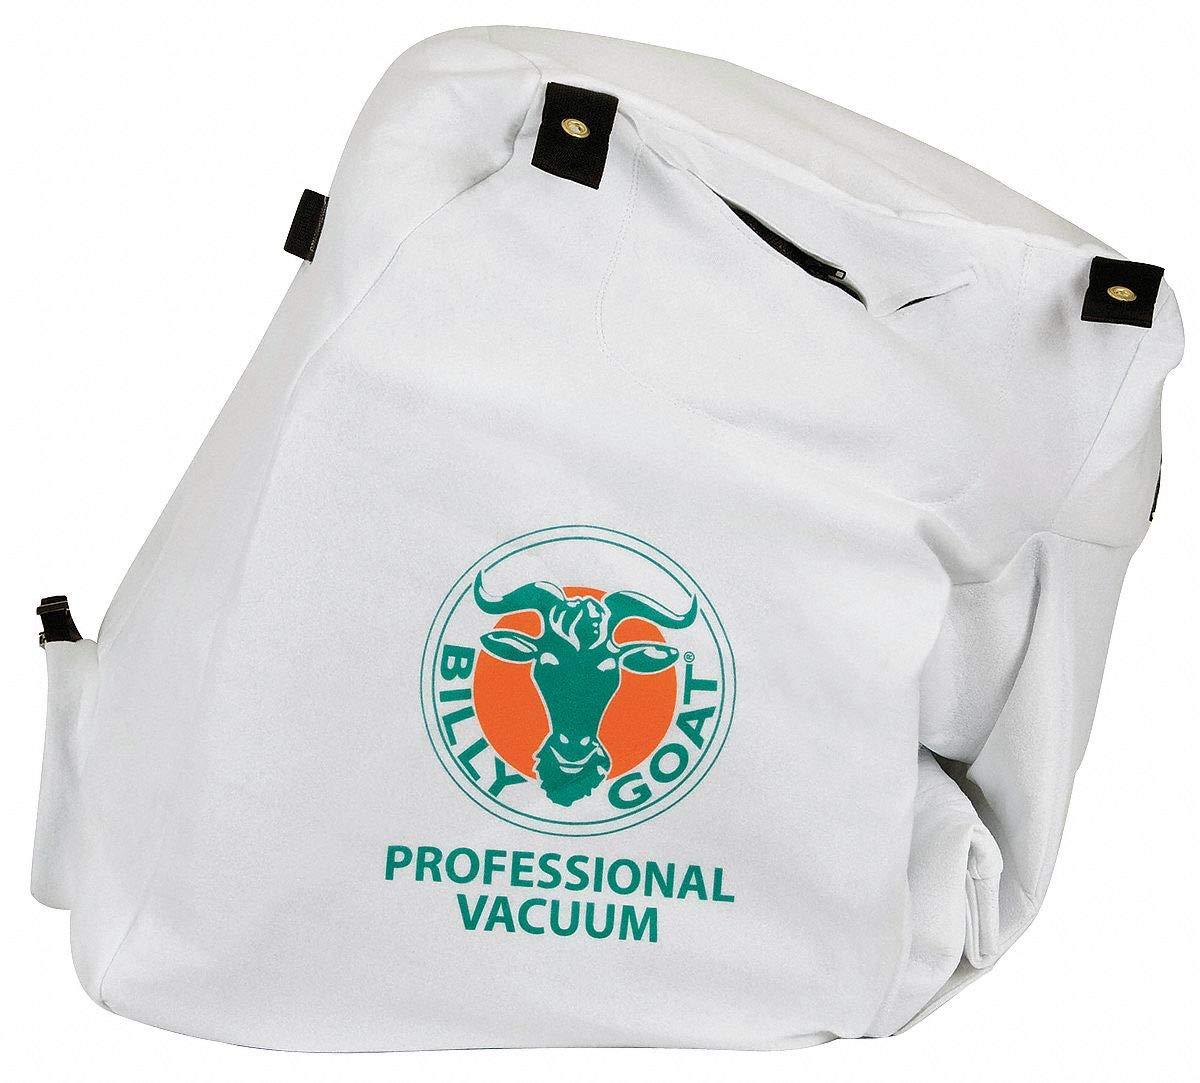 Felt Bag, For Use With MFR. NO. KV650H, KV650SPH